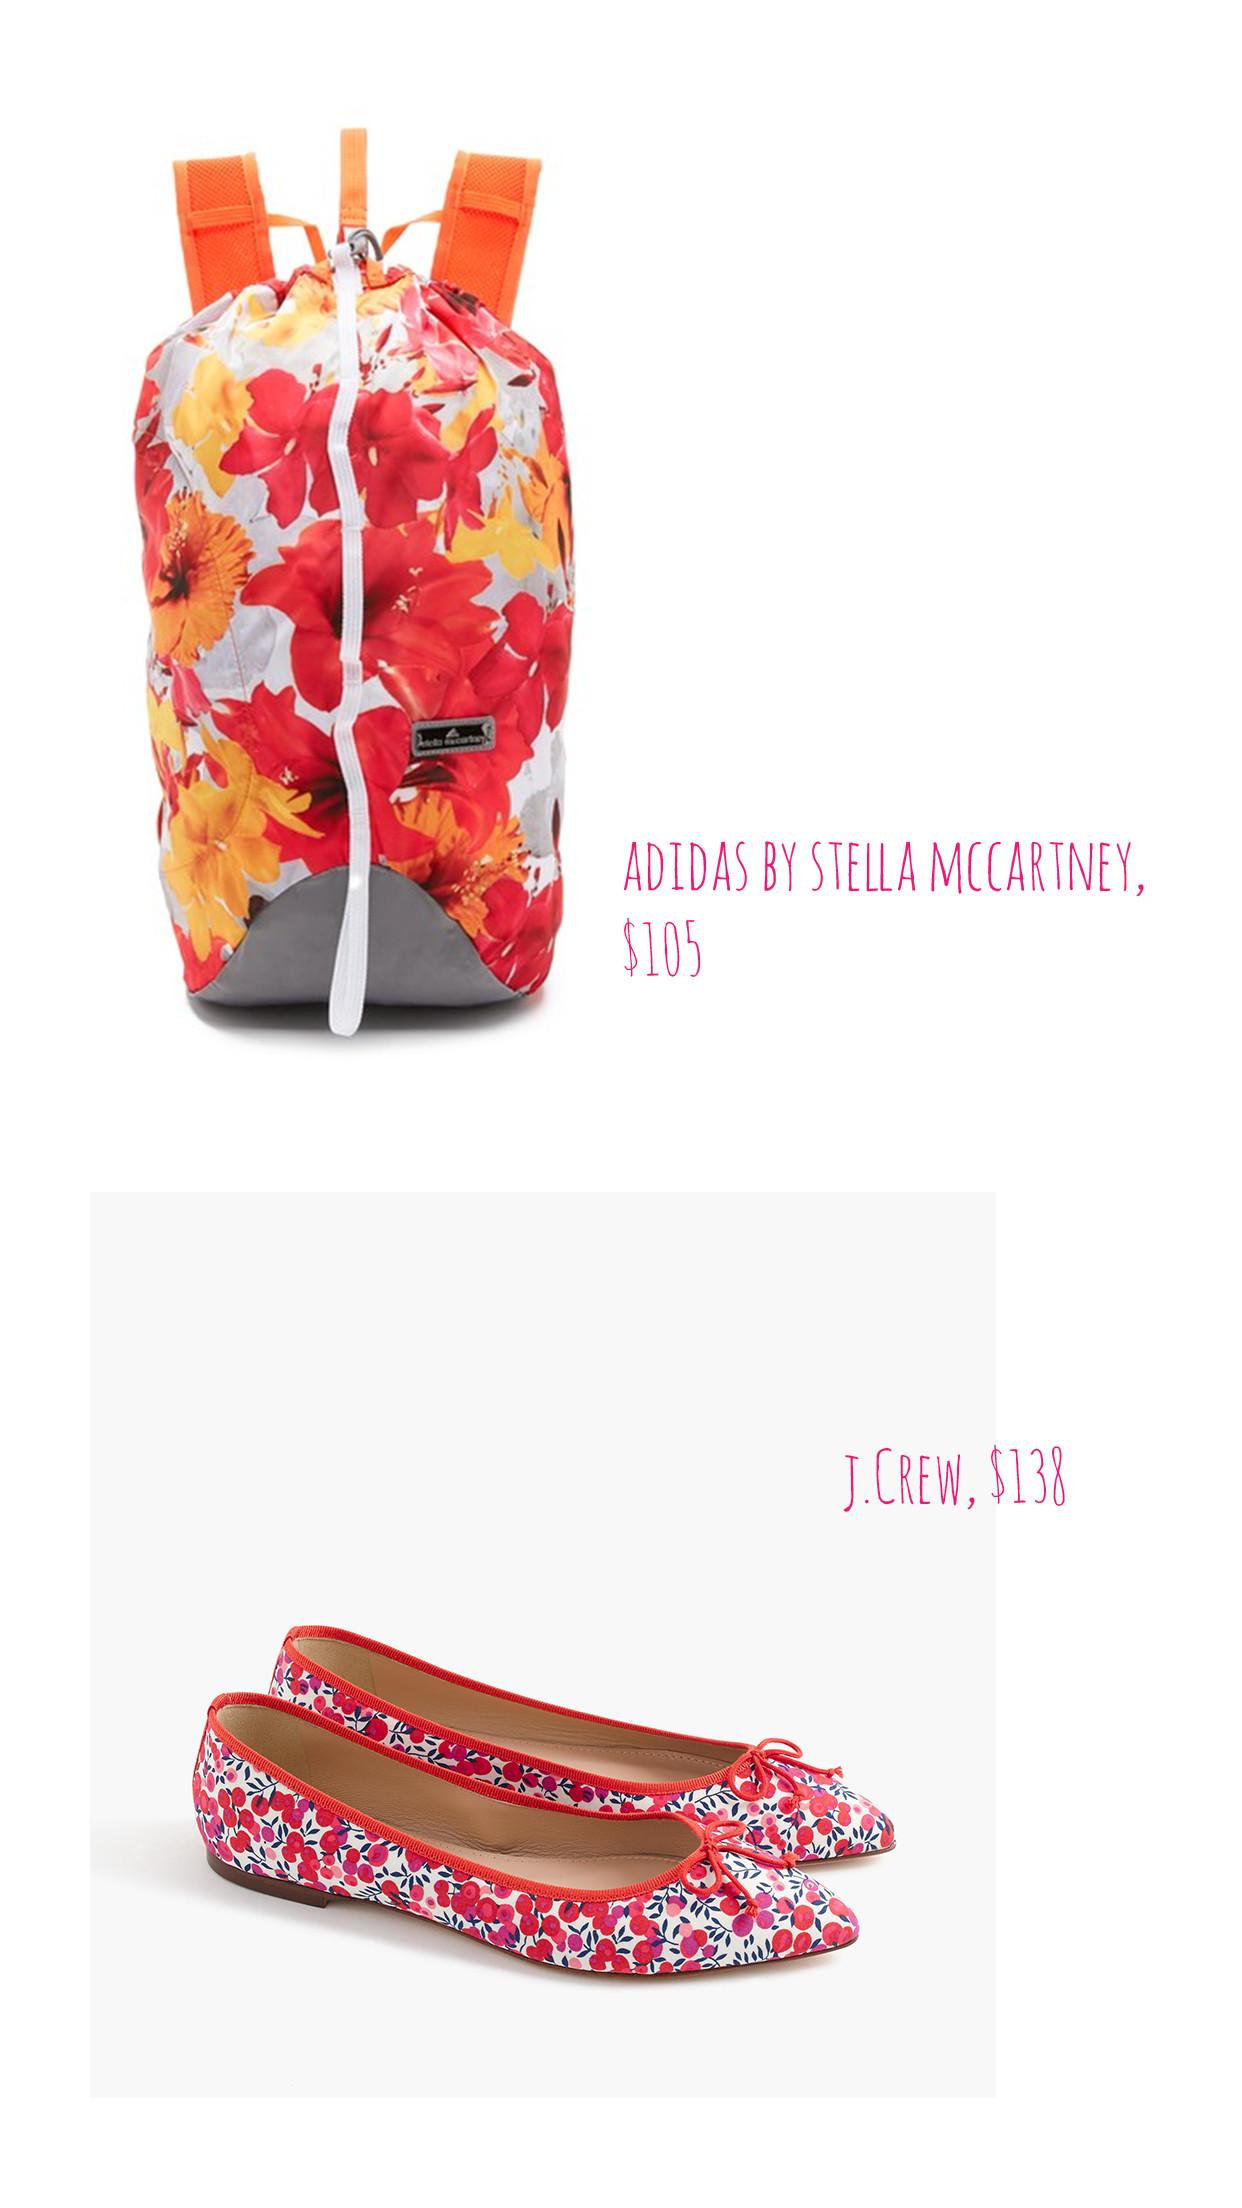 prints- adidas stella mccartney, j.crew